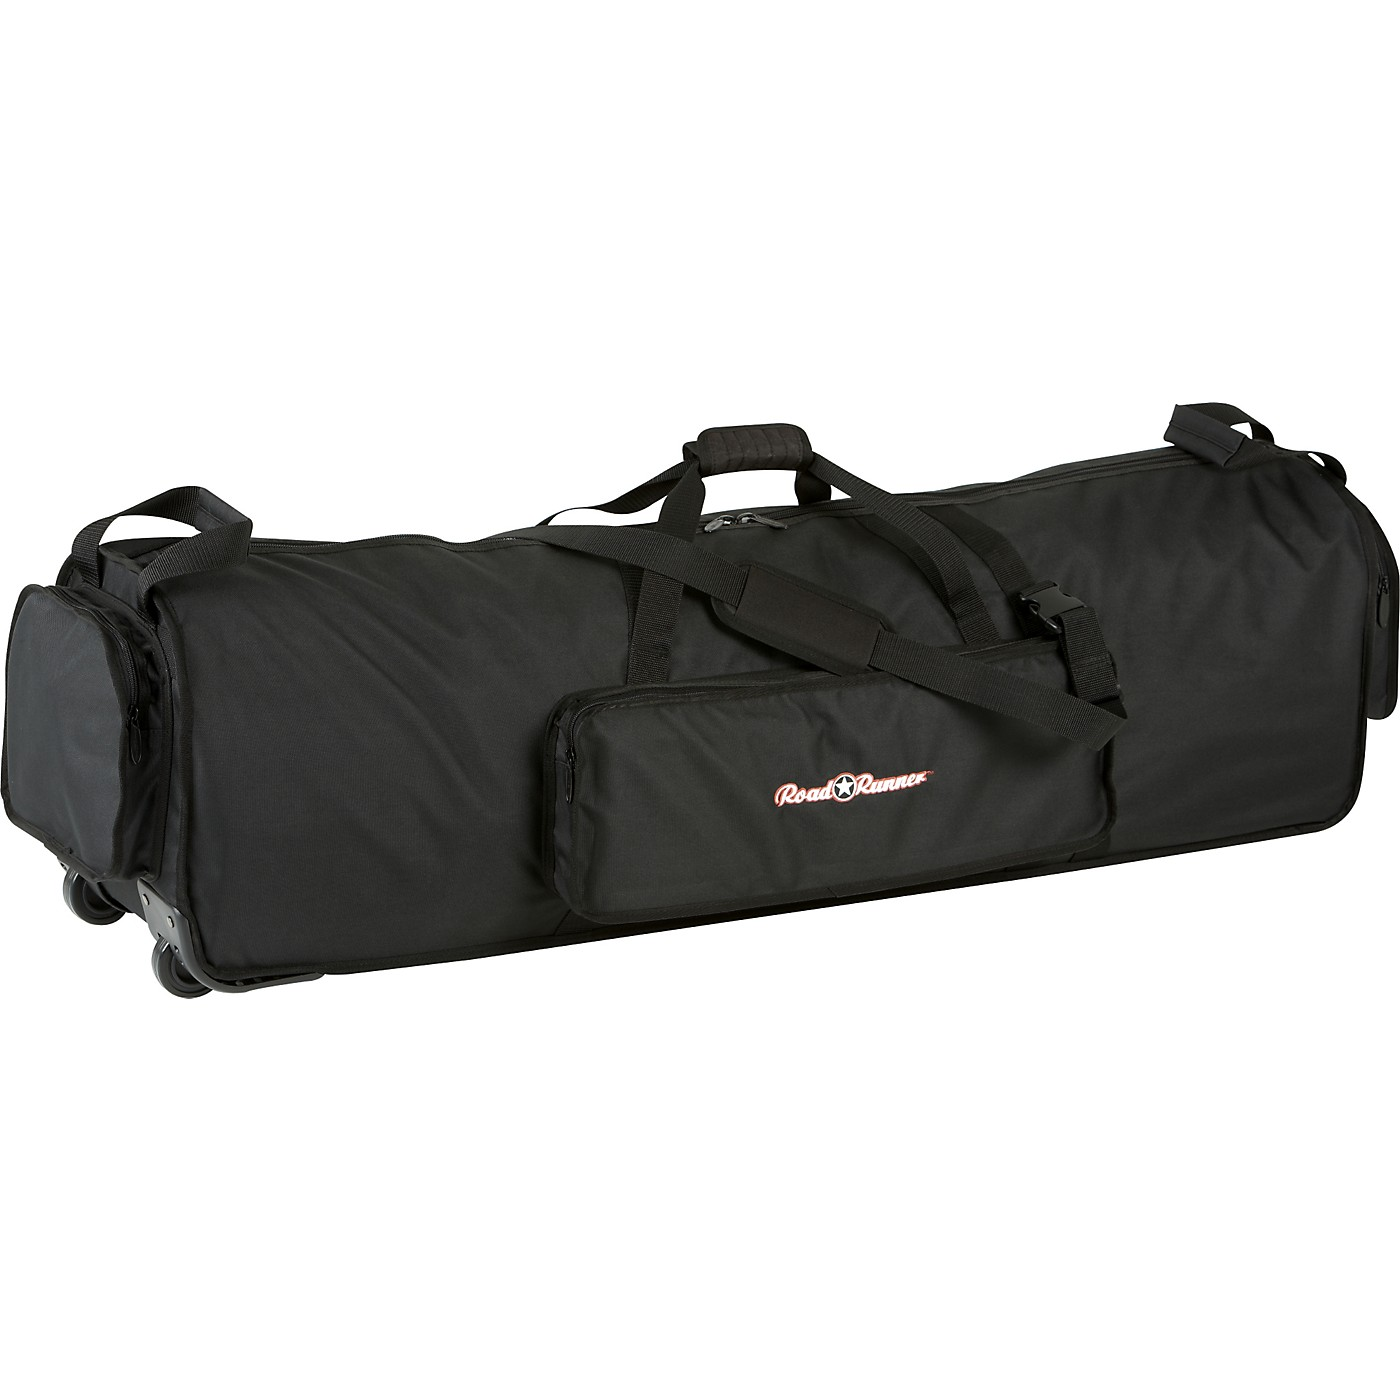 Road Runner Rolling Hardware Bag thumbnail